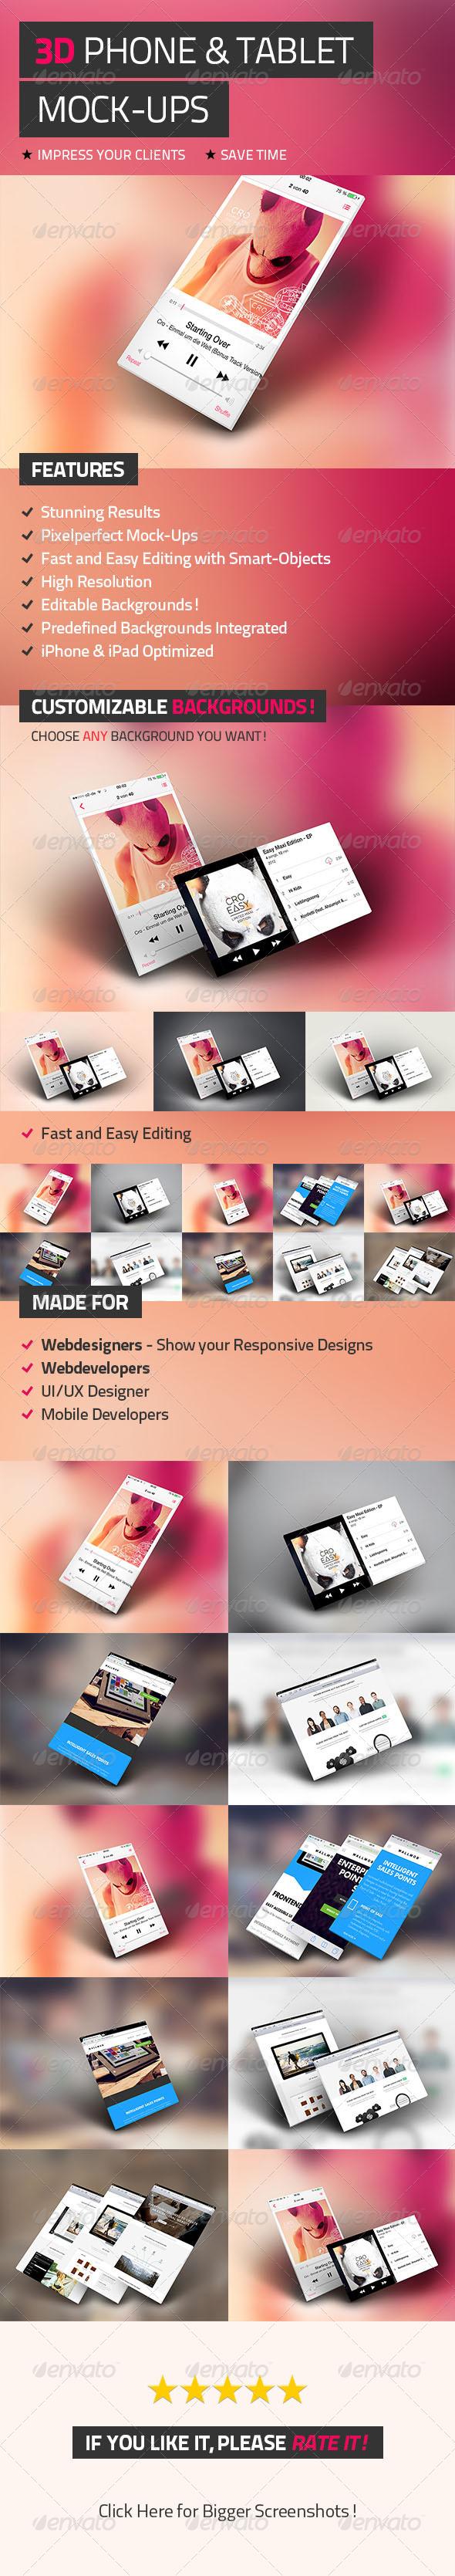 GraphicRiver 3D Phone & Tablet Mock-Ups 4995673